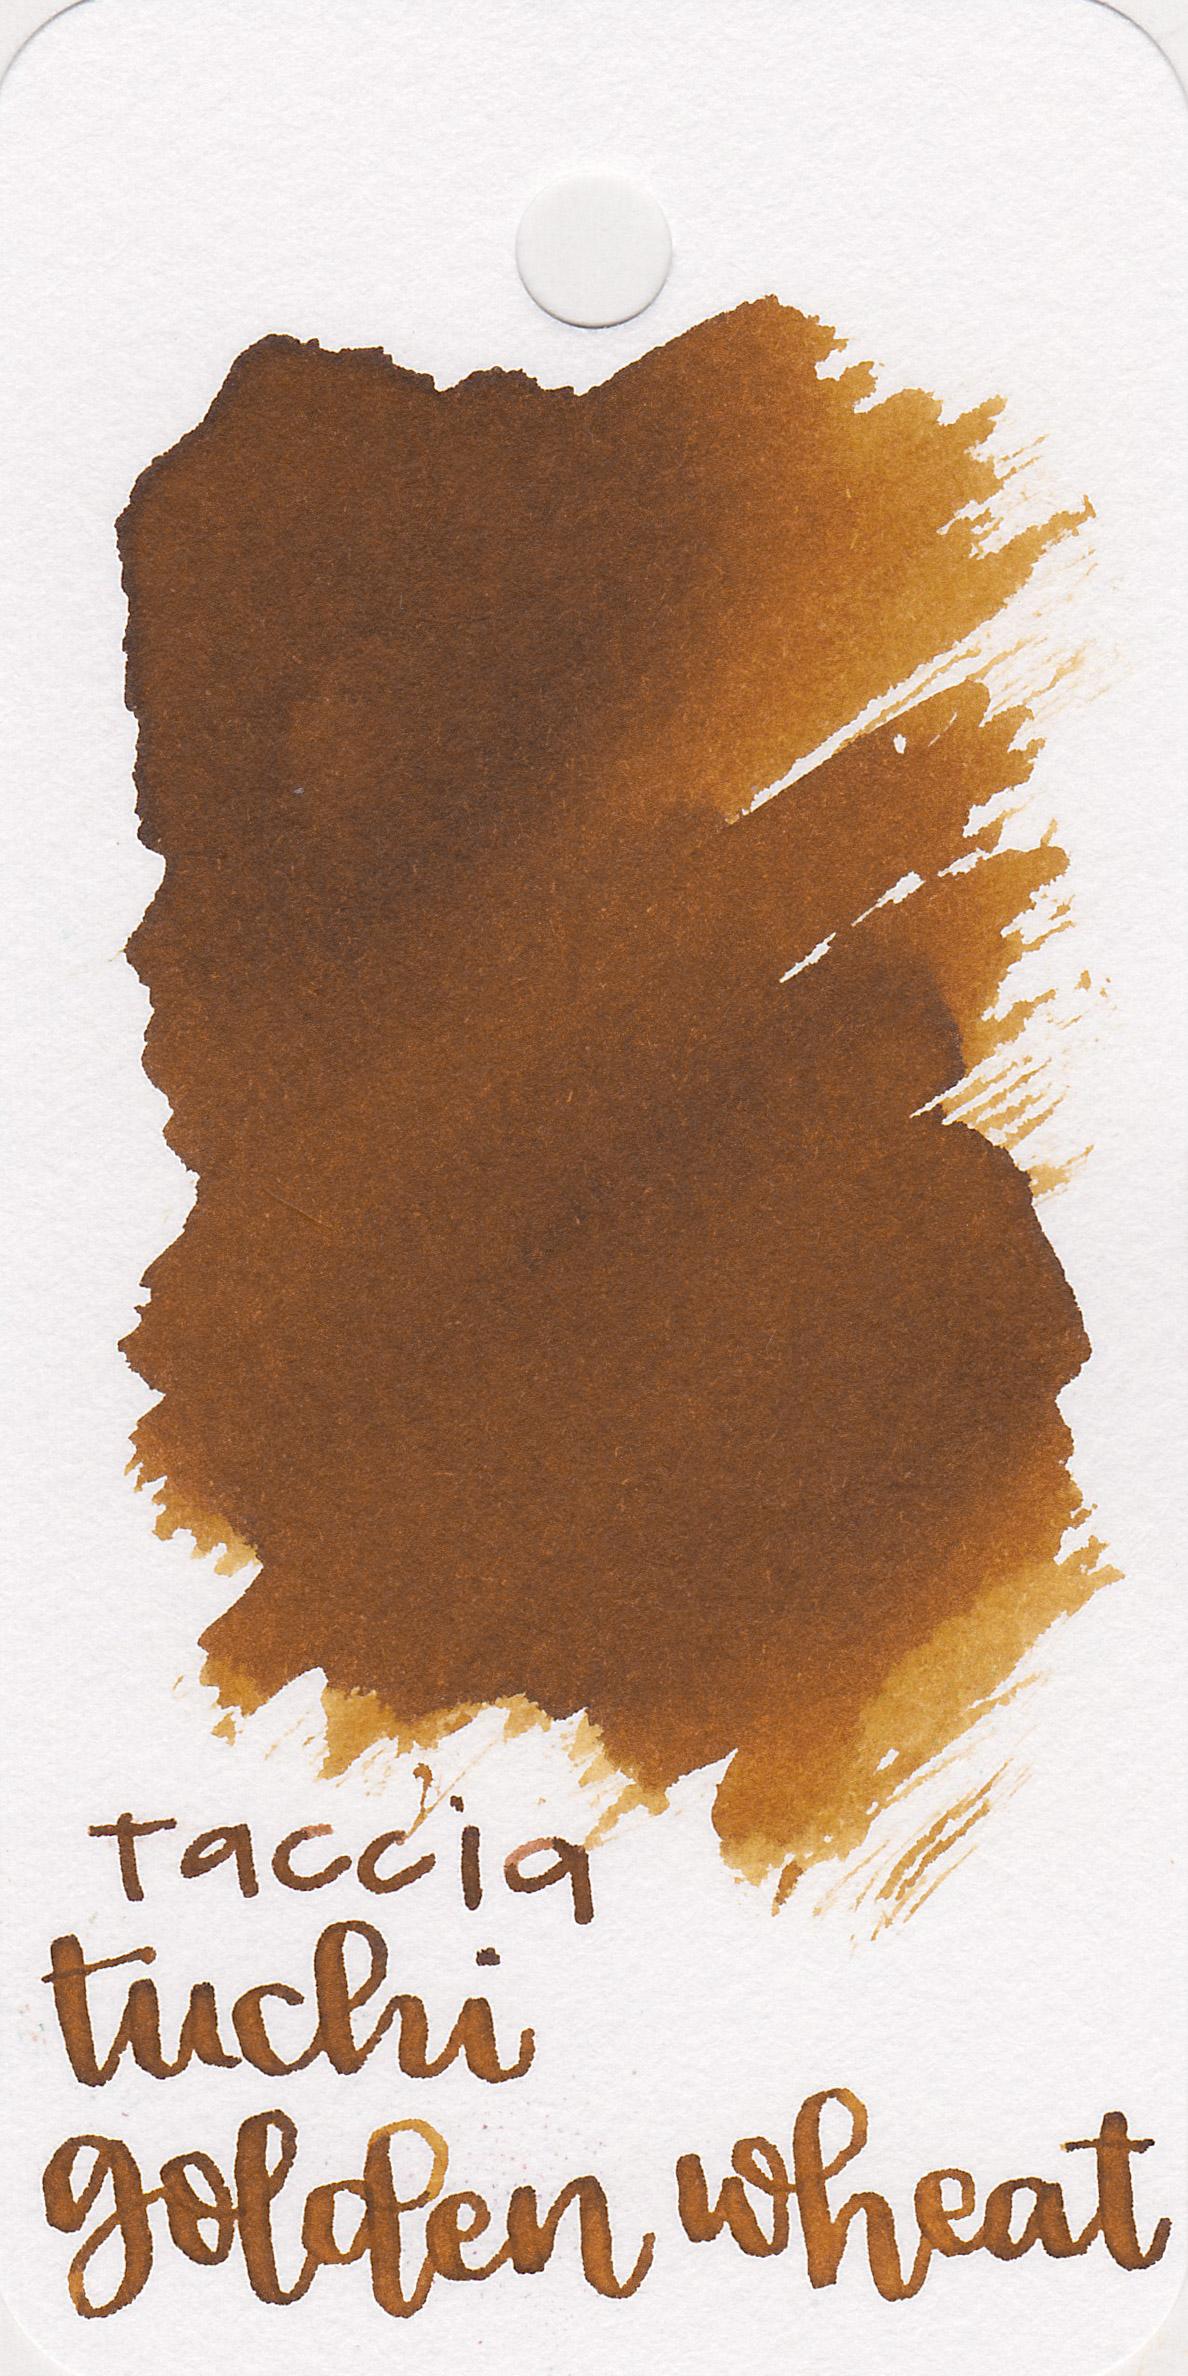 tac-tsuchi-golden-wheat-1.jpg